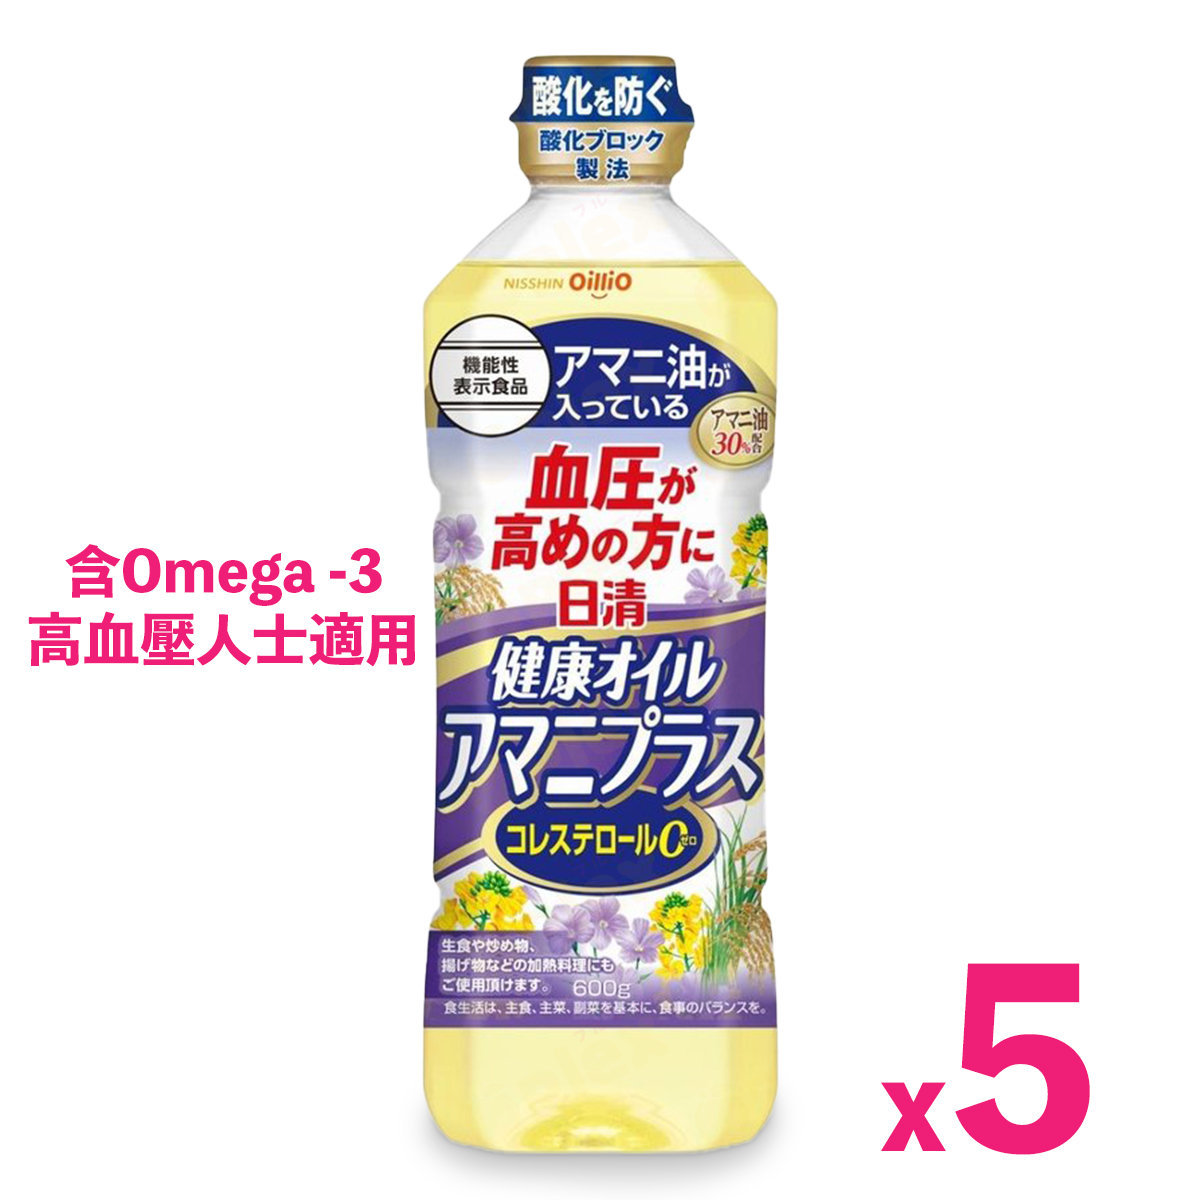 Oilio Healthy Blood Pressure Vegetable Oil (600ml) (Purple) x 5bottles